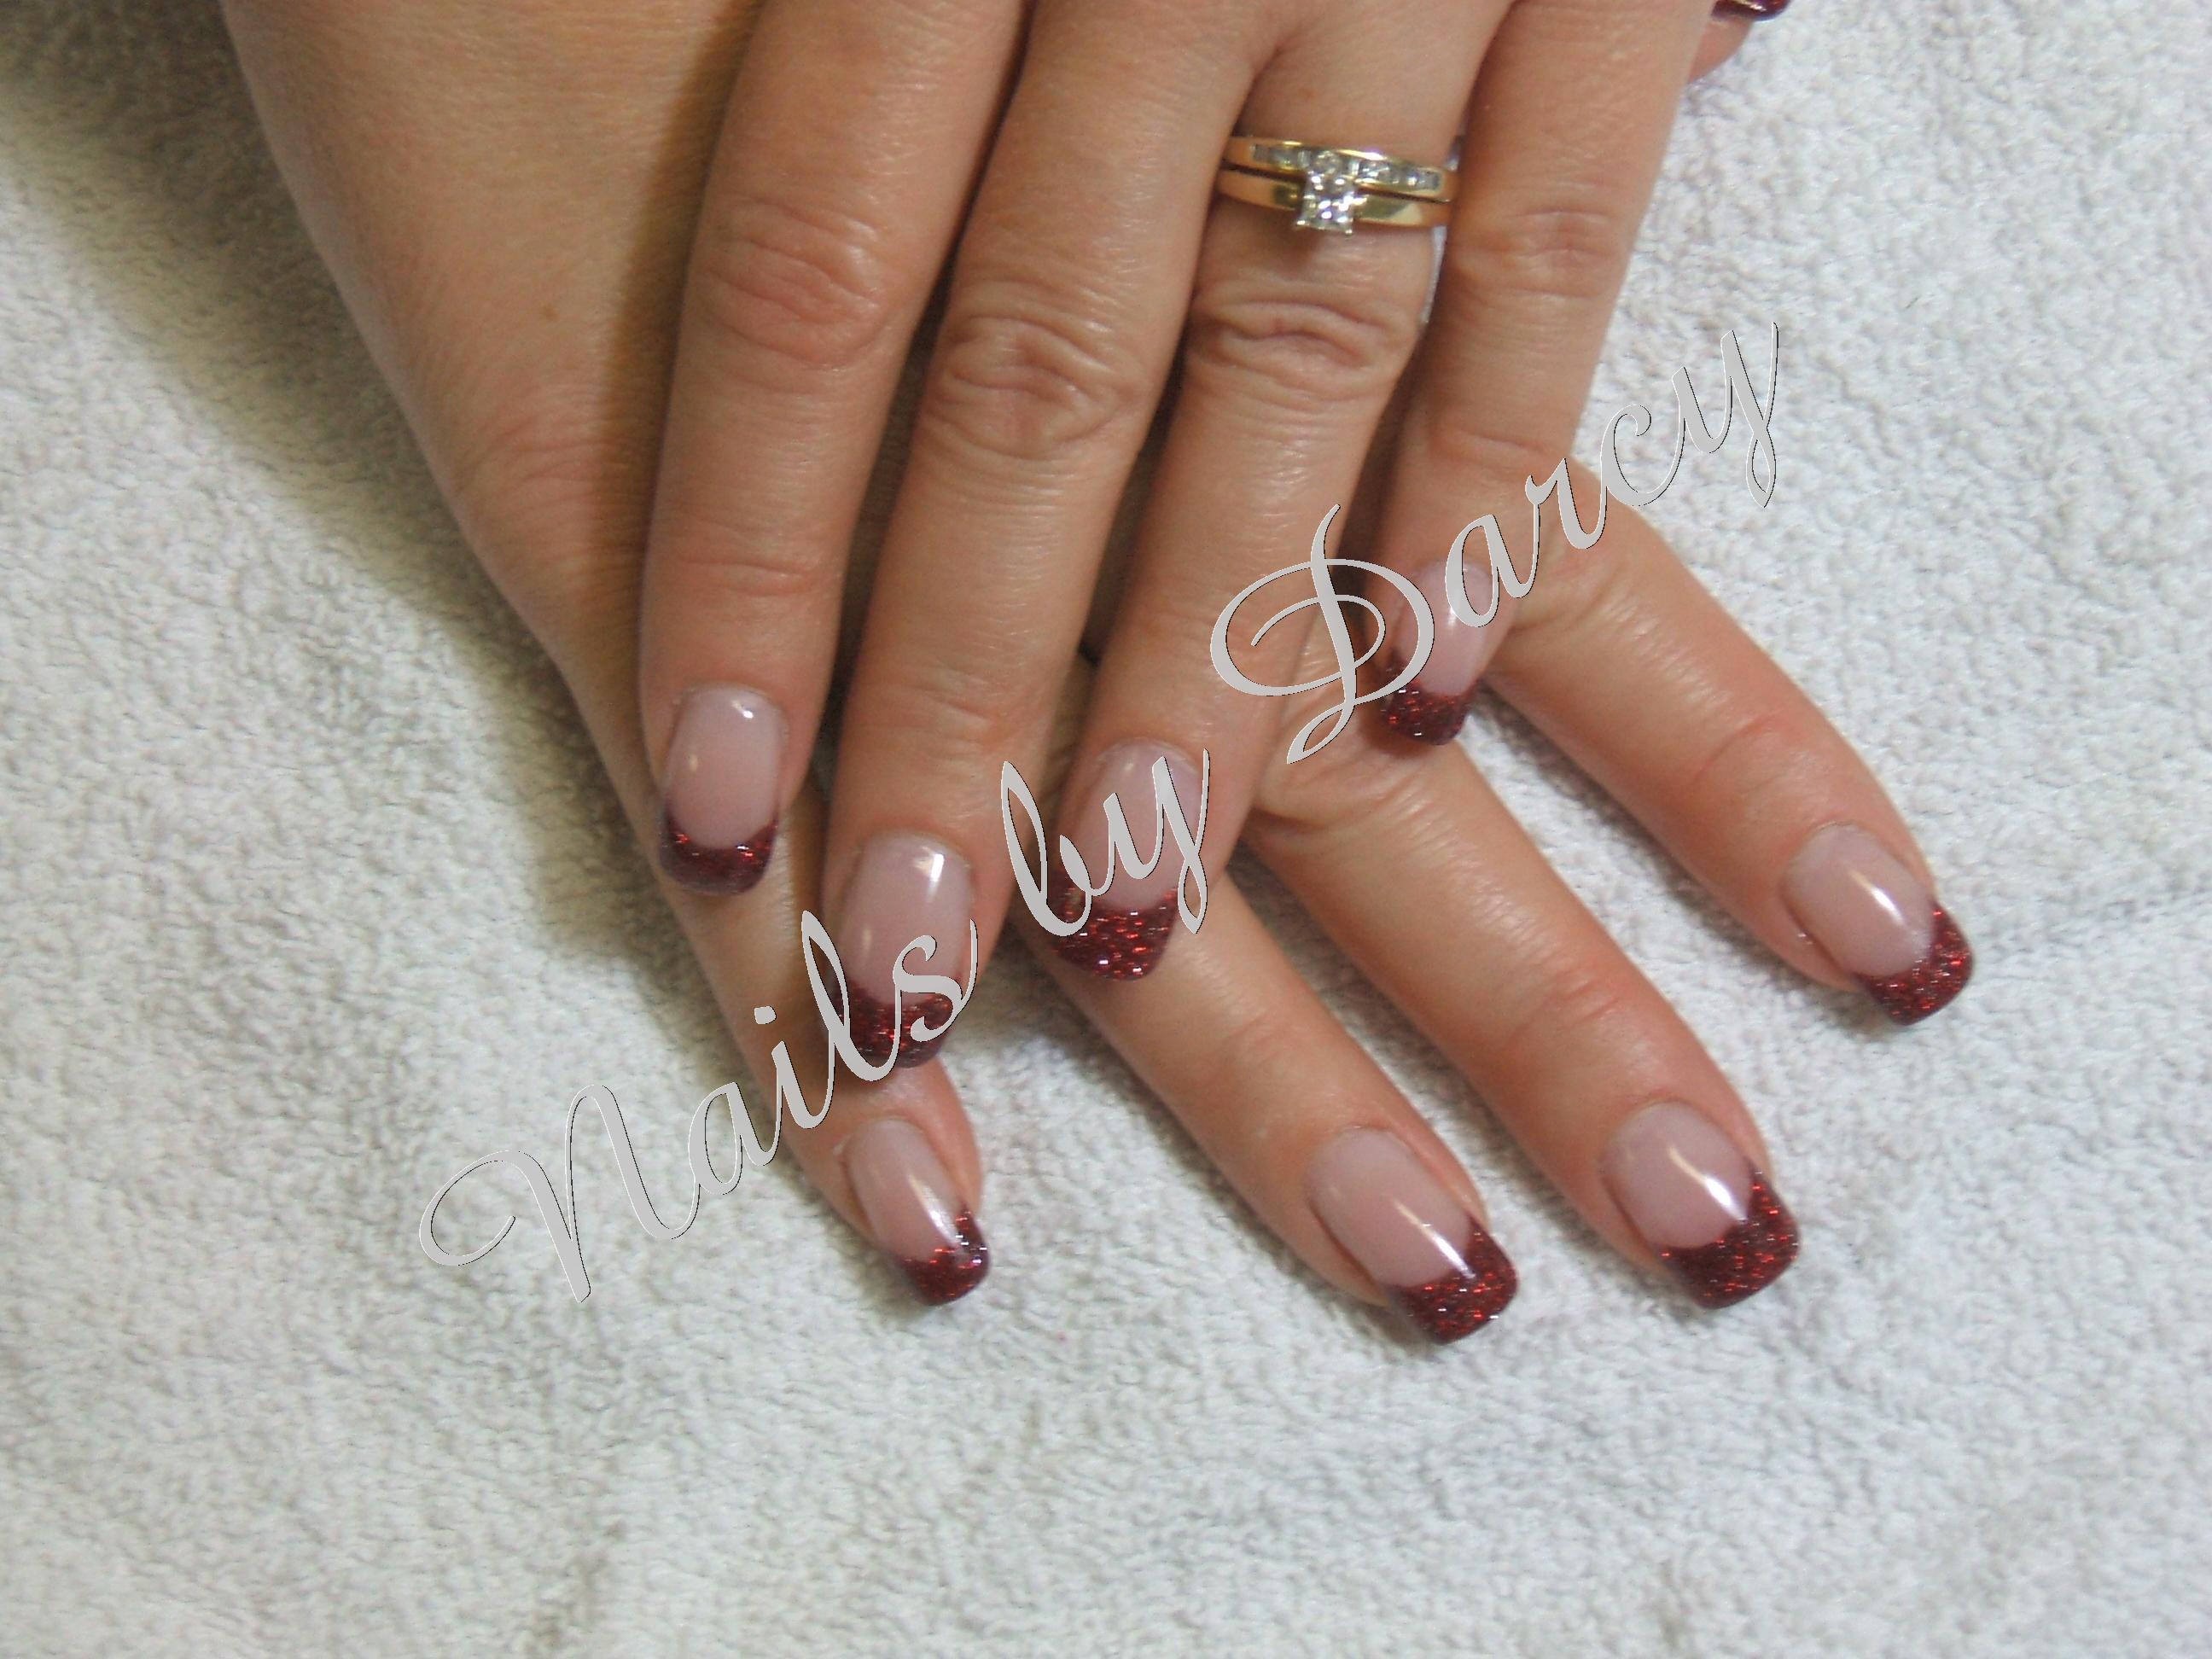 Fine Red Glitter Tips Nails Motif - Nail Art Ideas - morihati.com